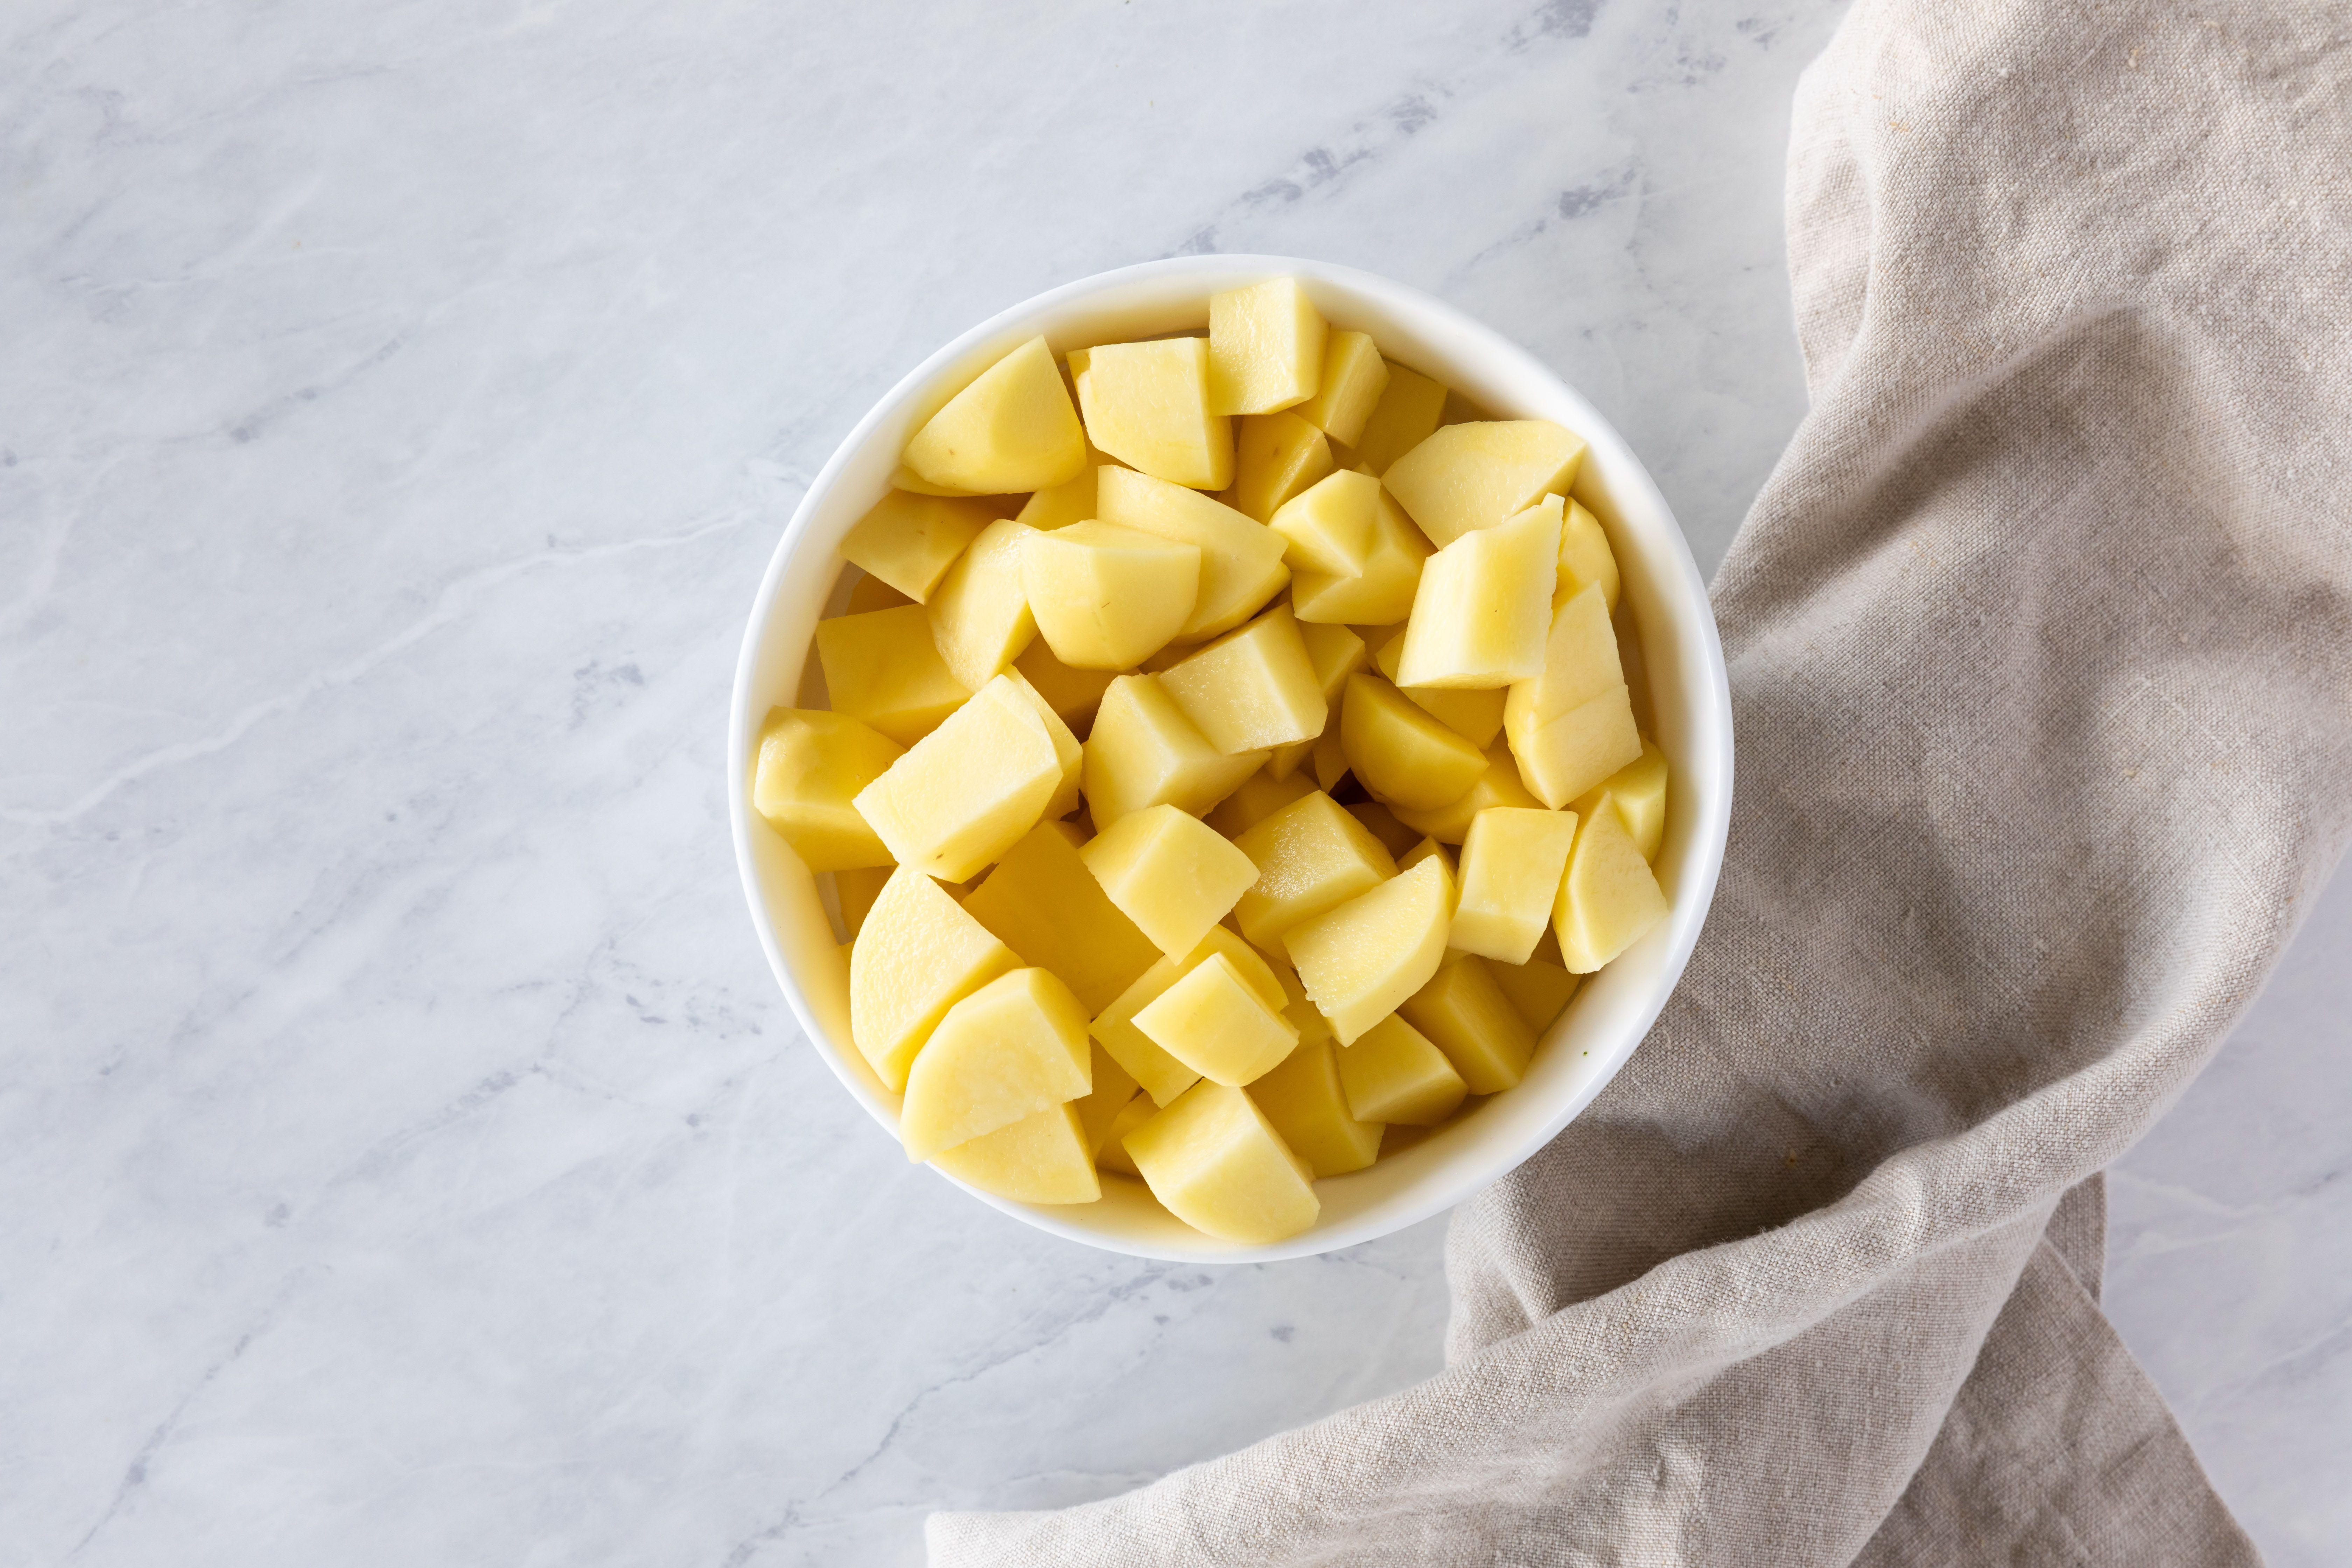 Cube potatoes